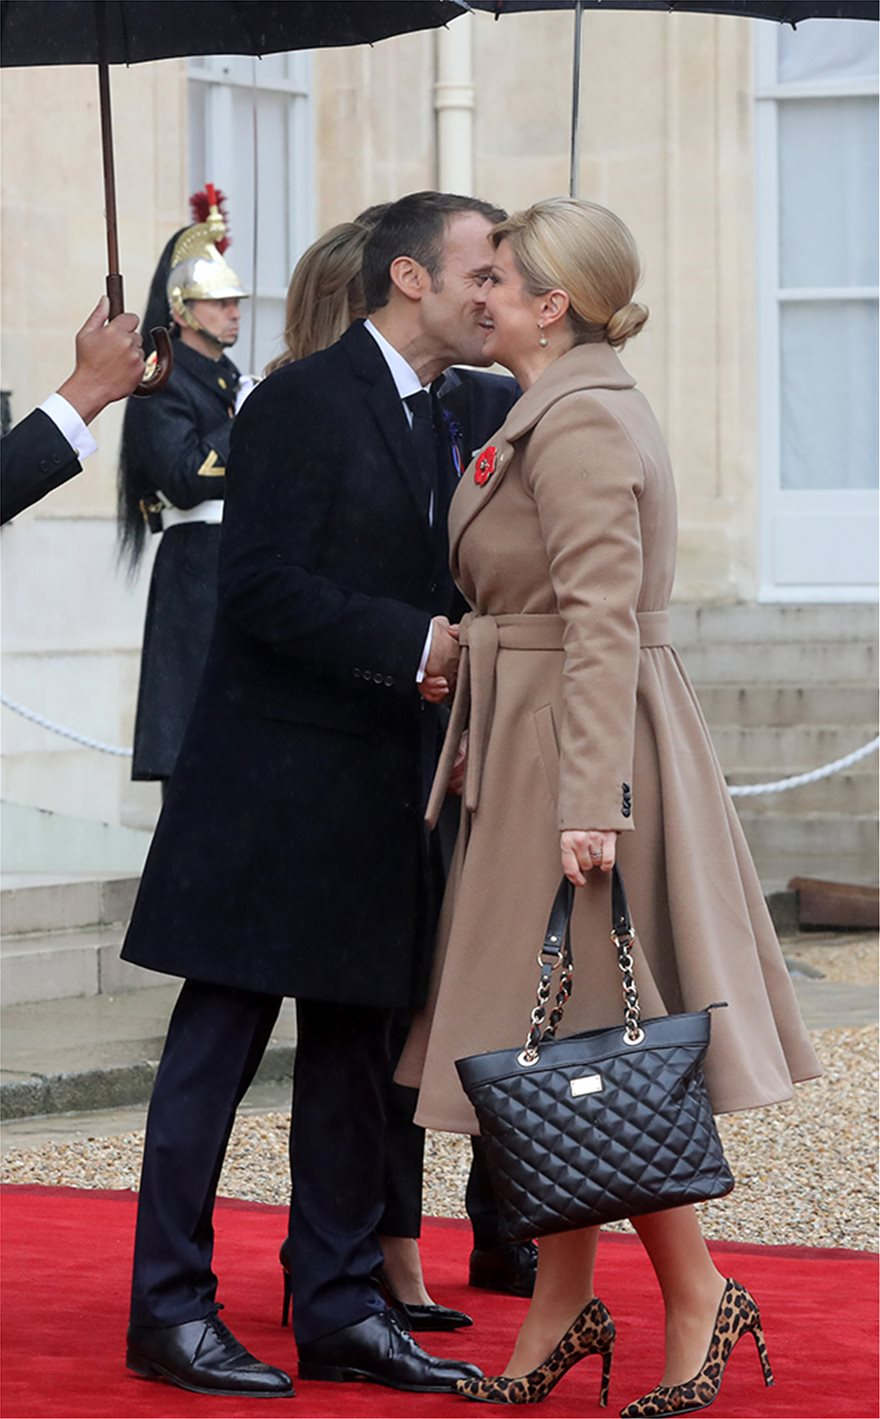 macron_kiss_kroatia_100yrs_wwi